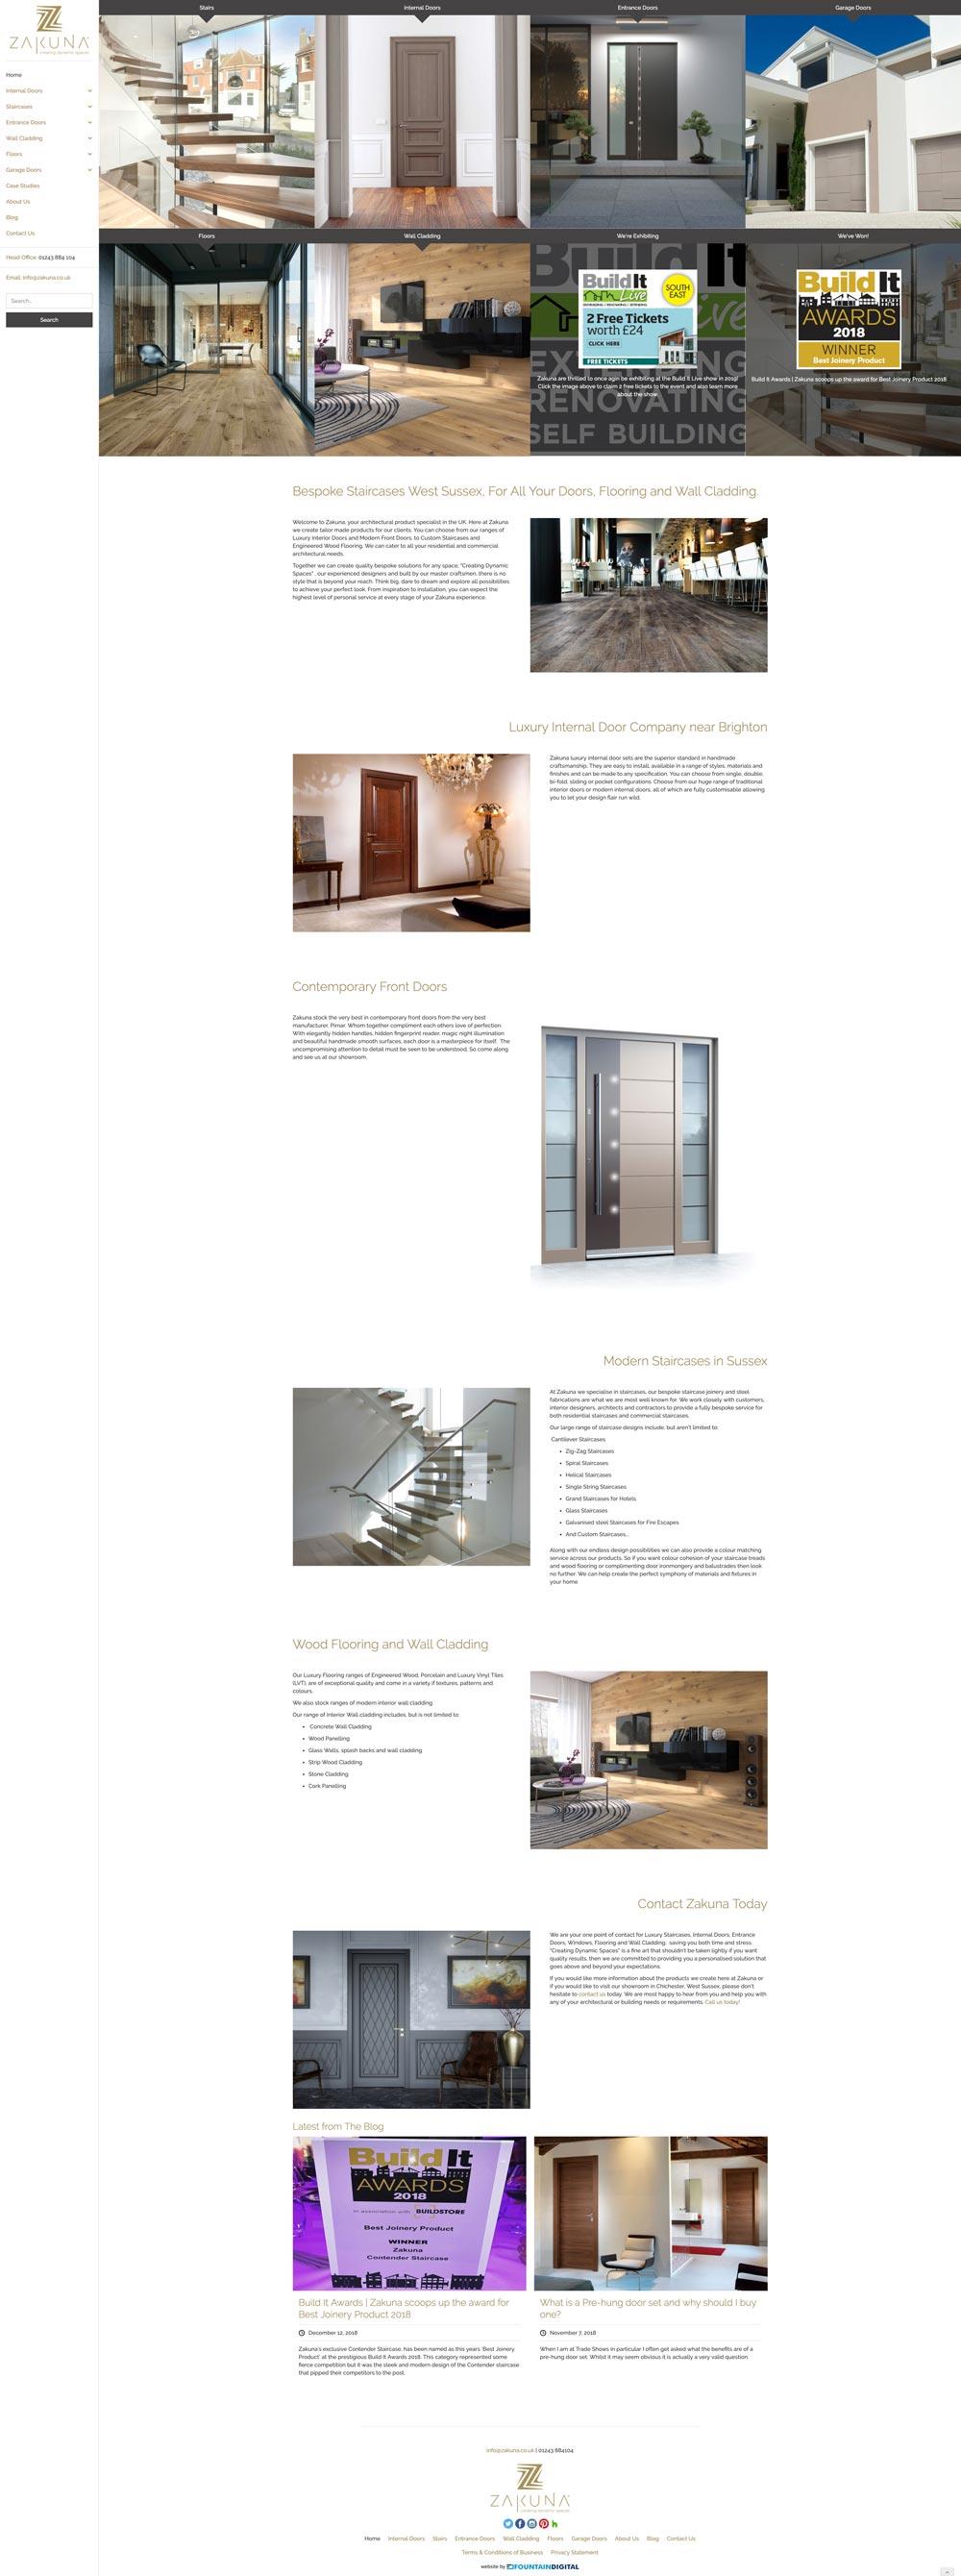 desktop image of website design